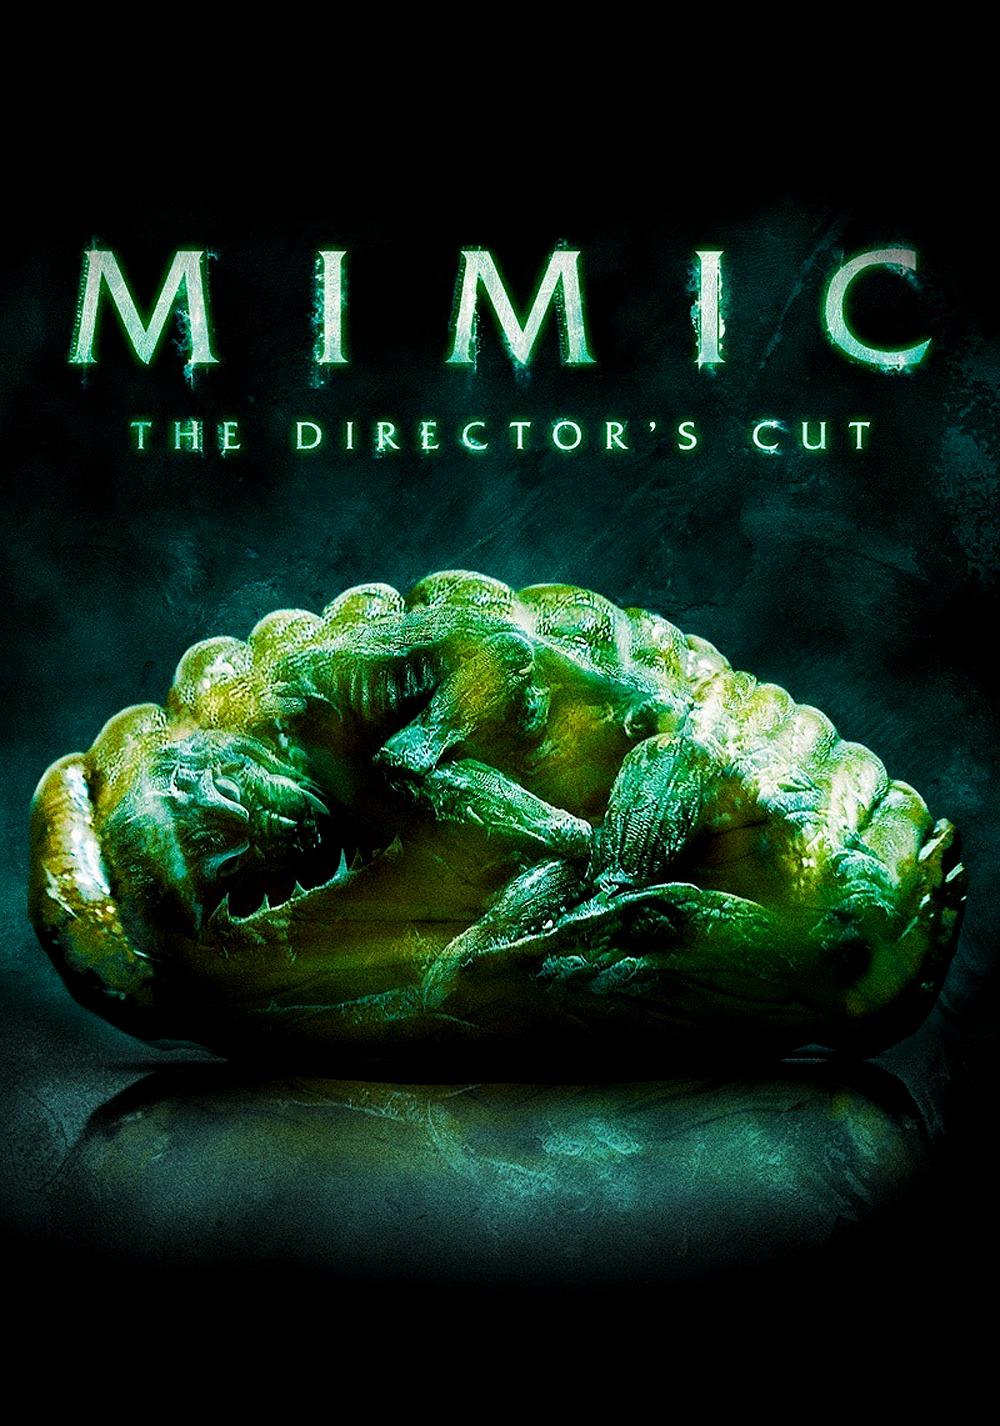 Mimic Movie fanart